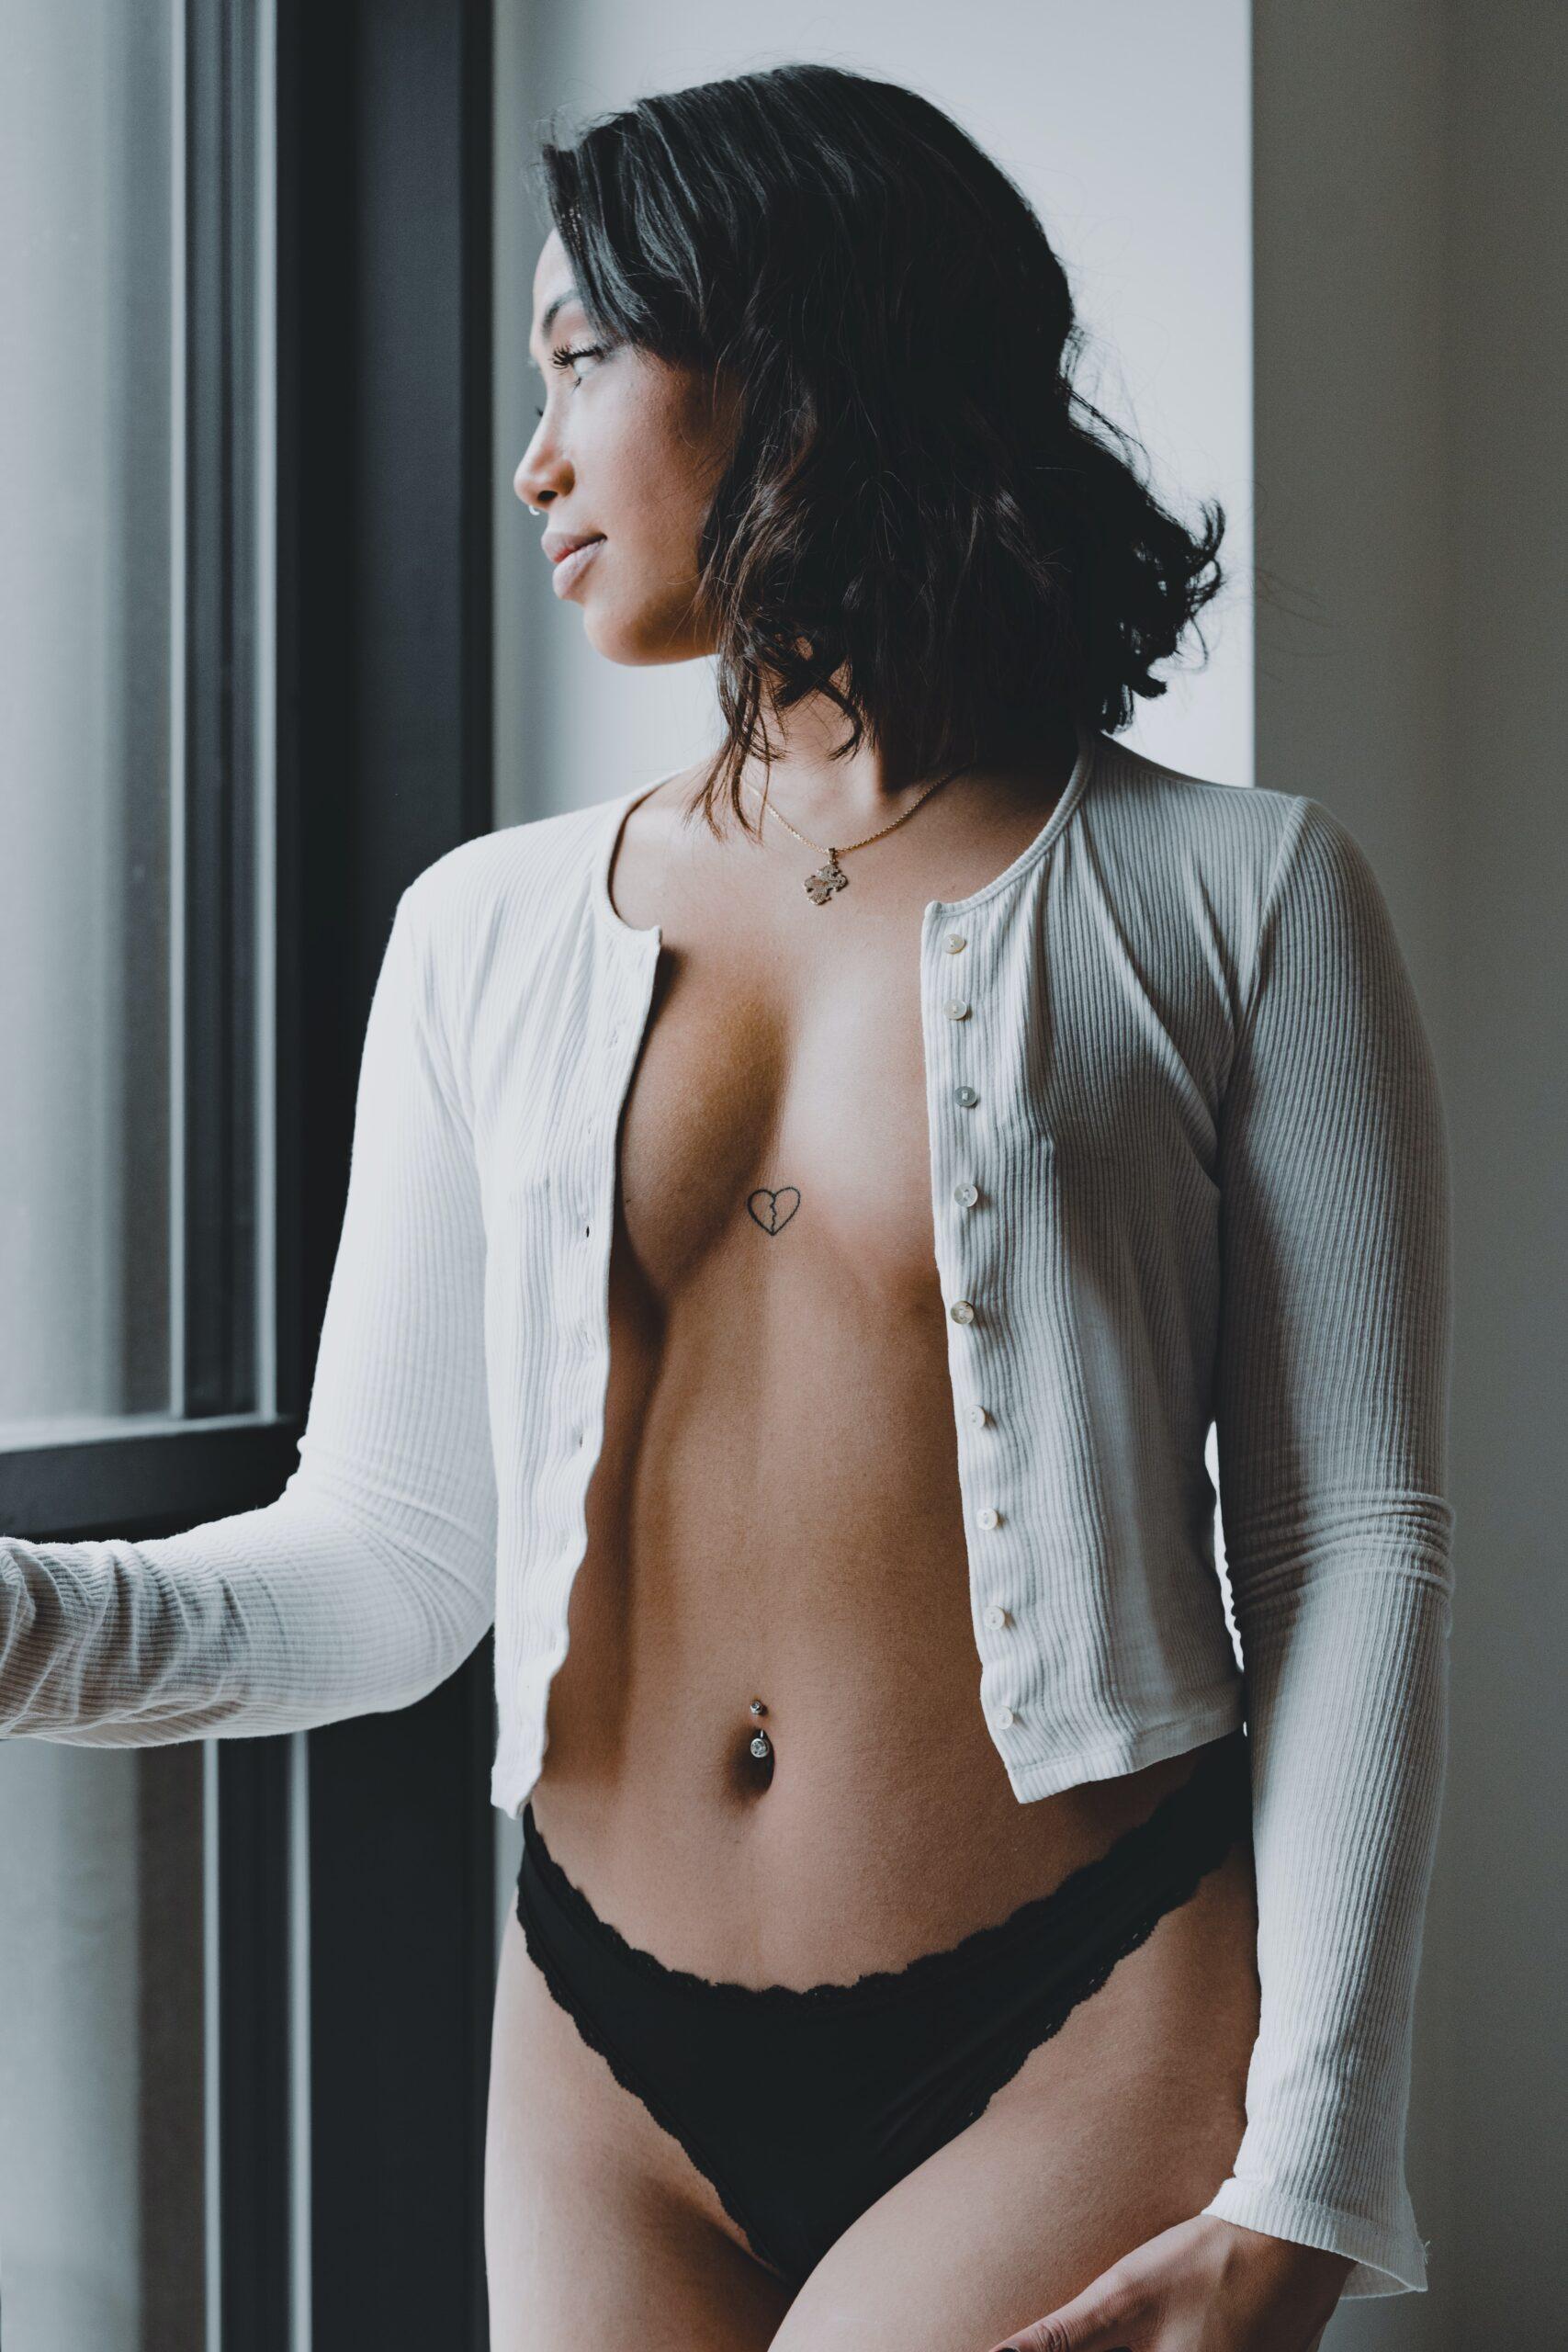 malik-skydsgaard-African American Woman -unsplash